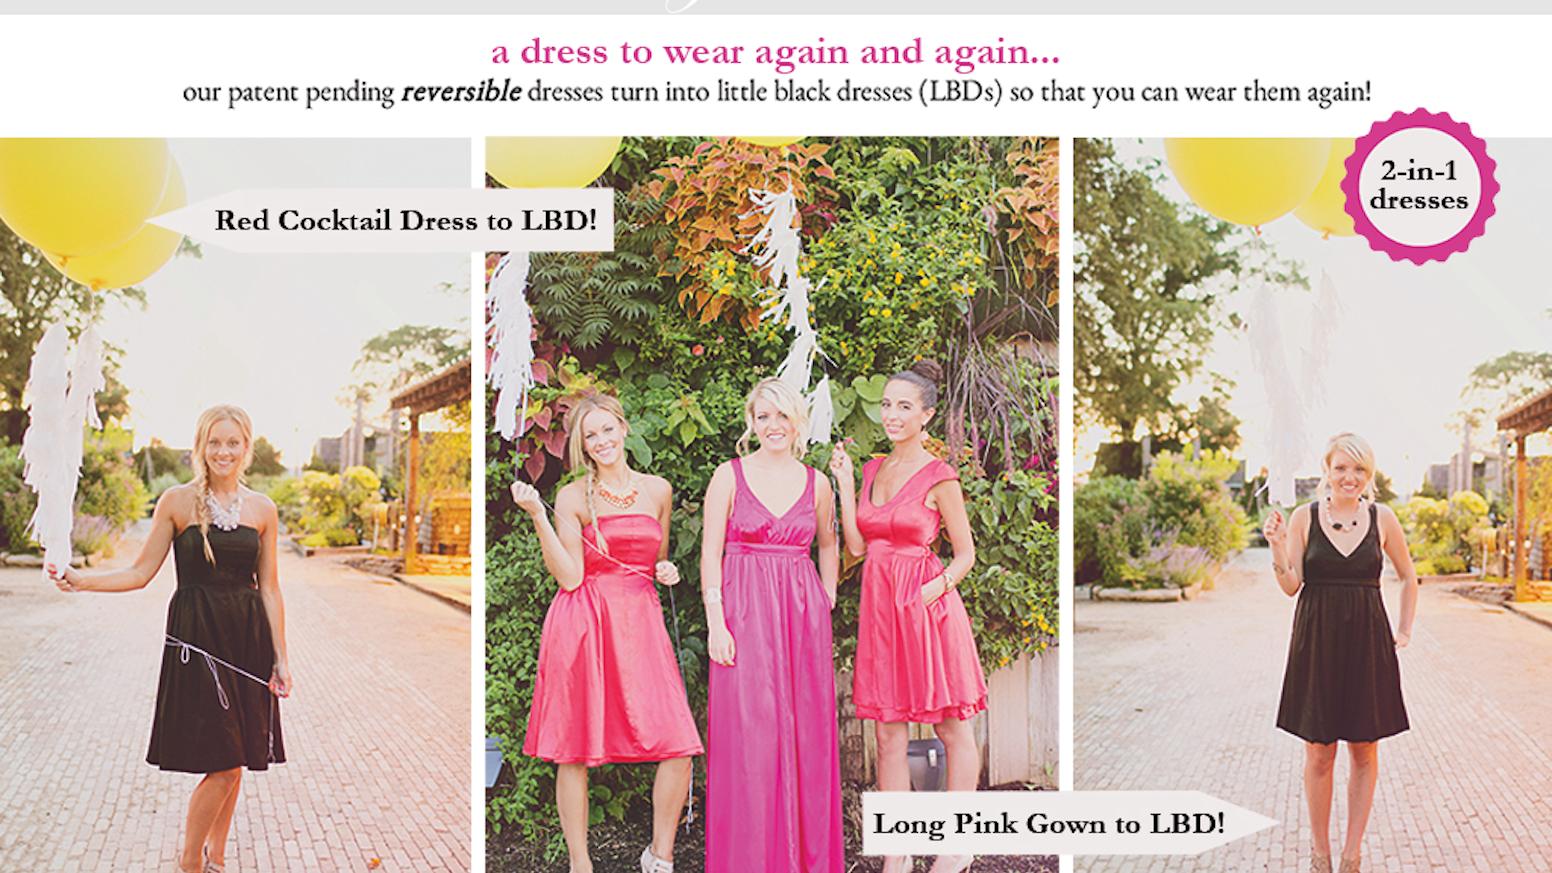 Durga kali reversible bridesmaid dresses by durga mccurdy durga kali reversible bridesmaid dresses ombrellifo Images